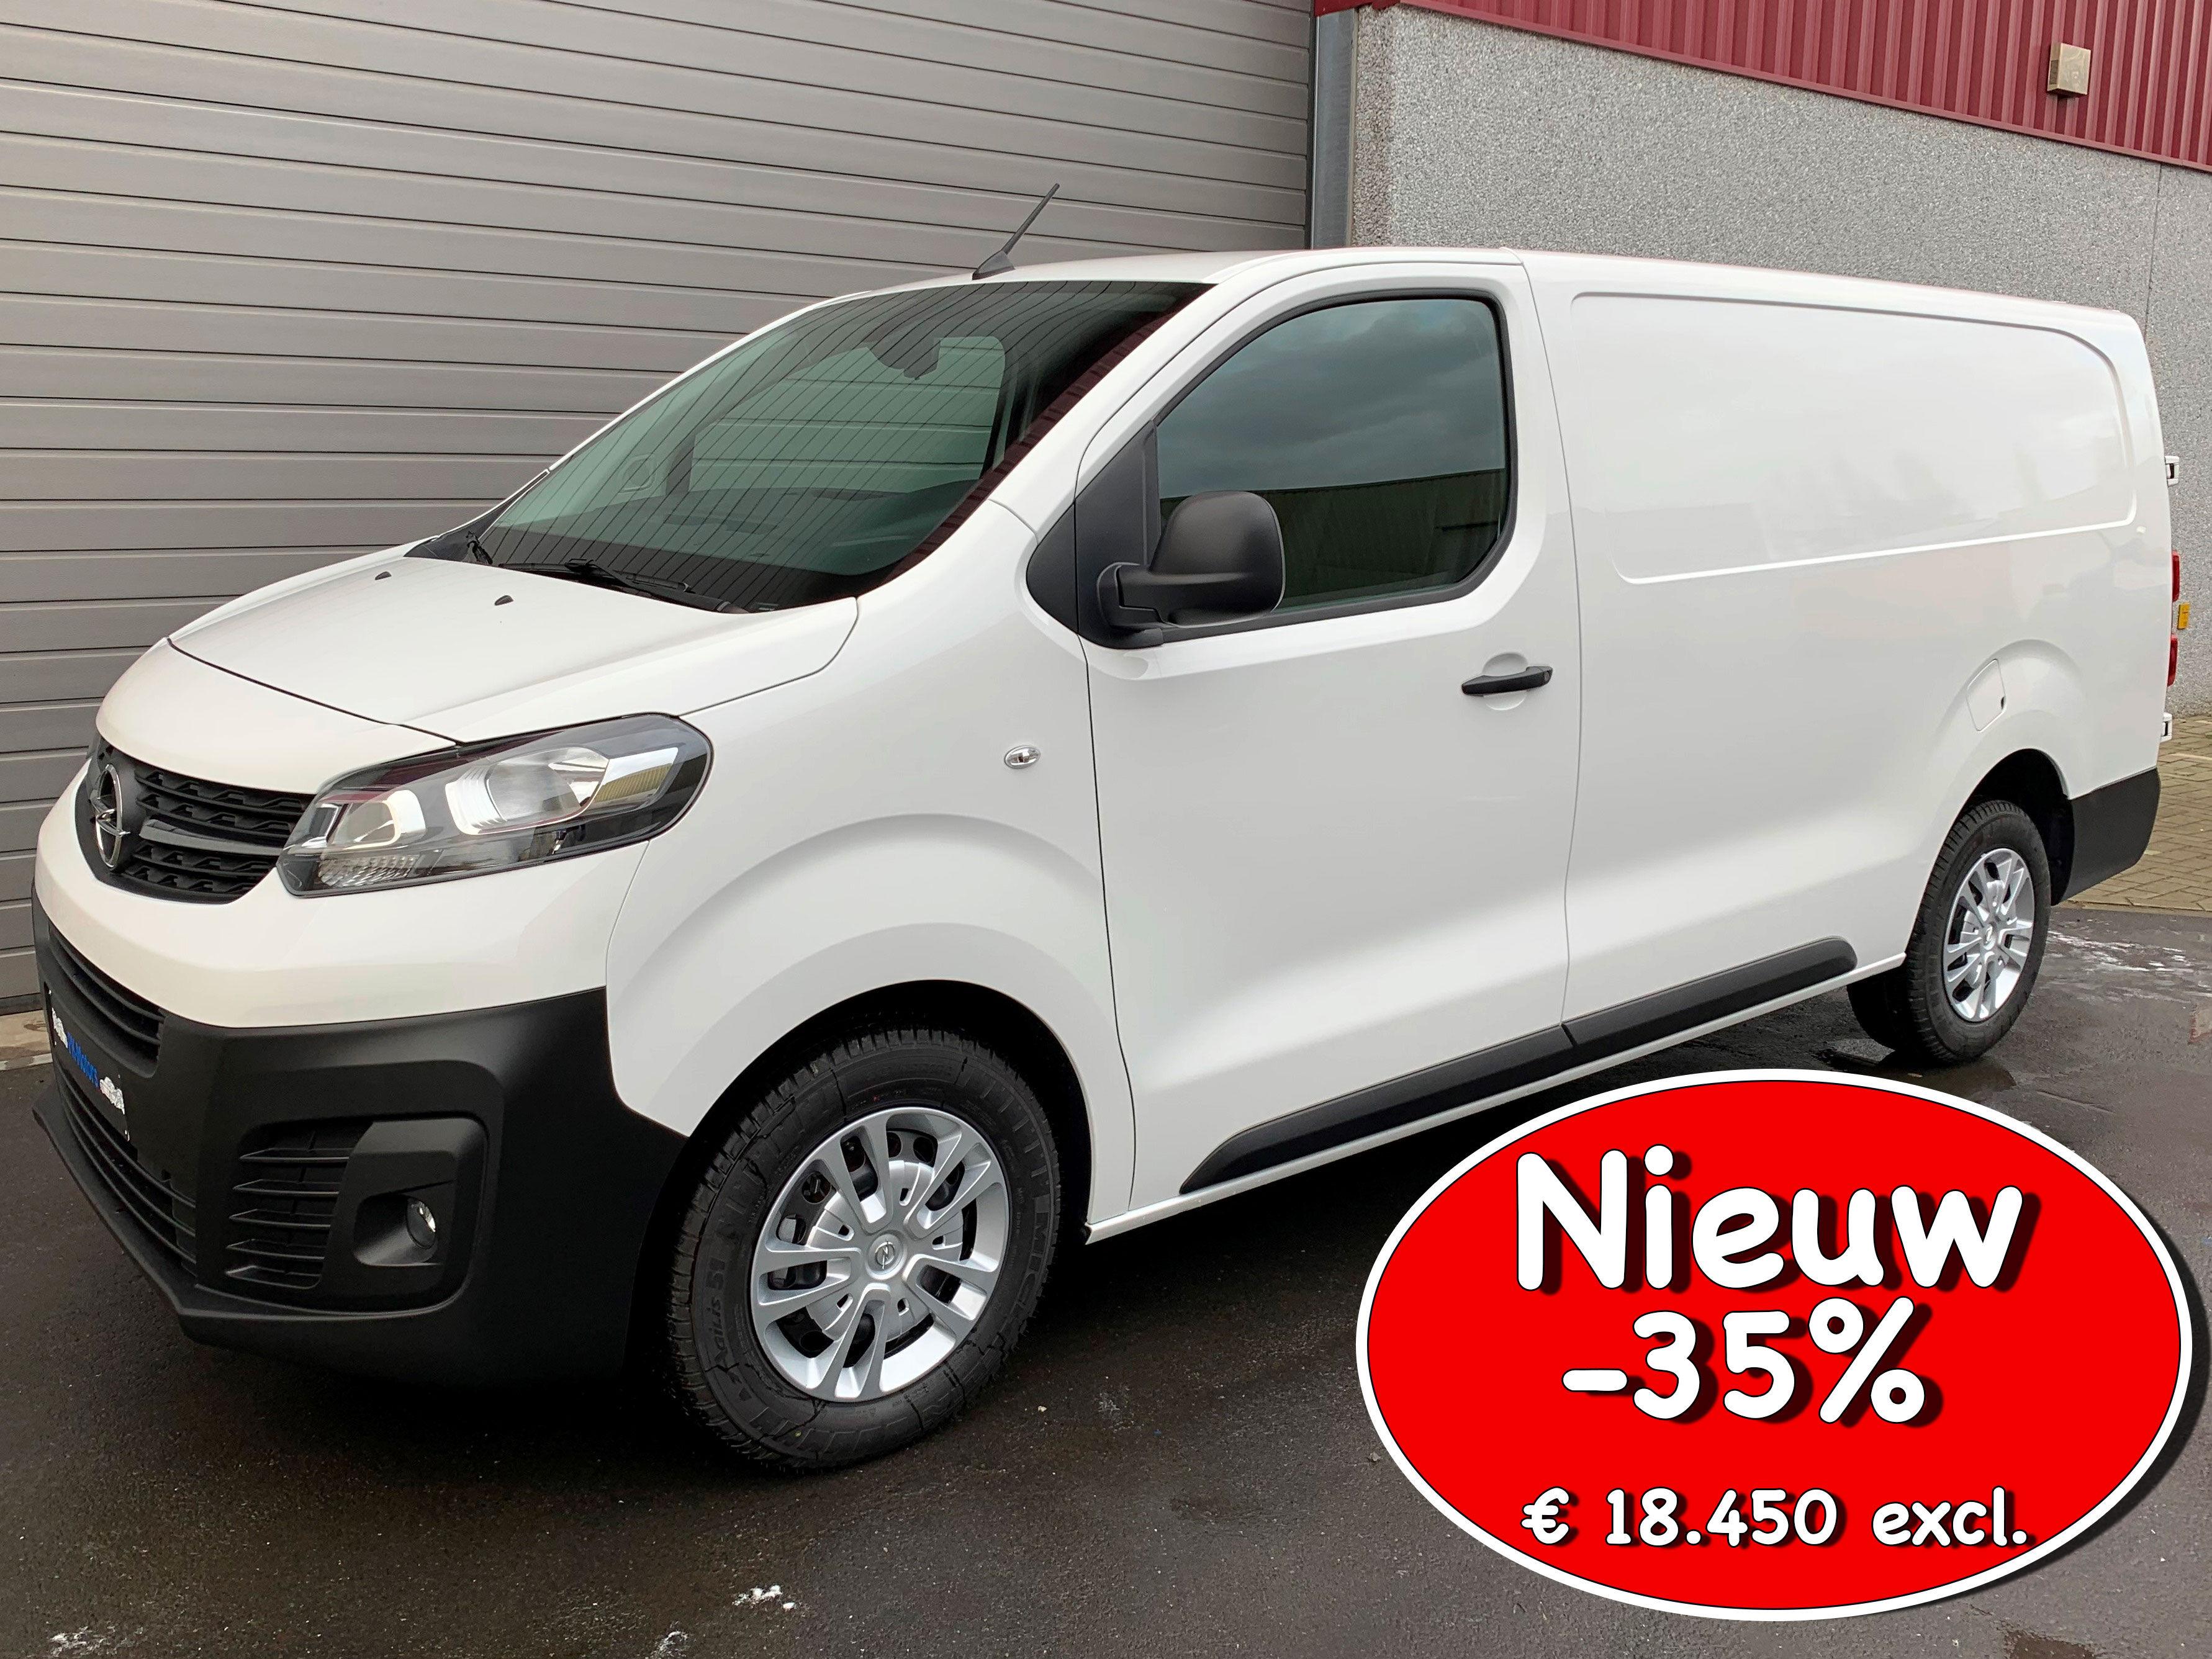 Opel Vivaro 2.0D 122PK Edition L3H1 NIEUW in stock 35% korting 1/29